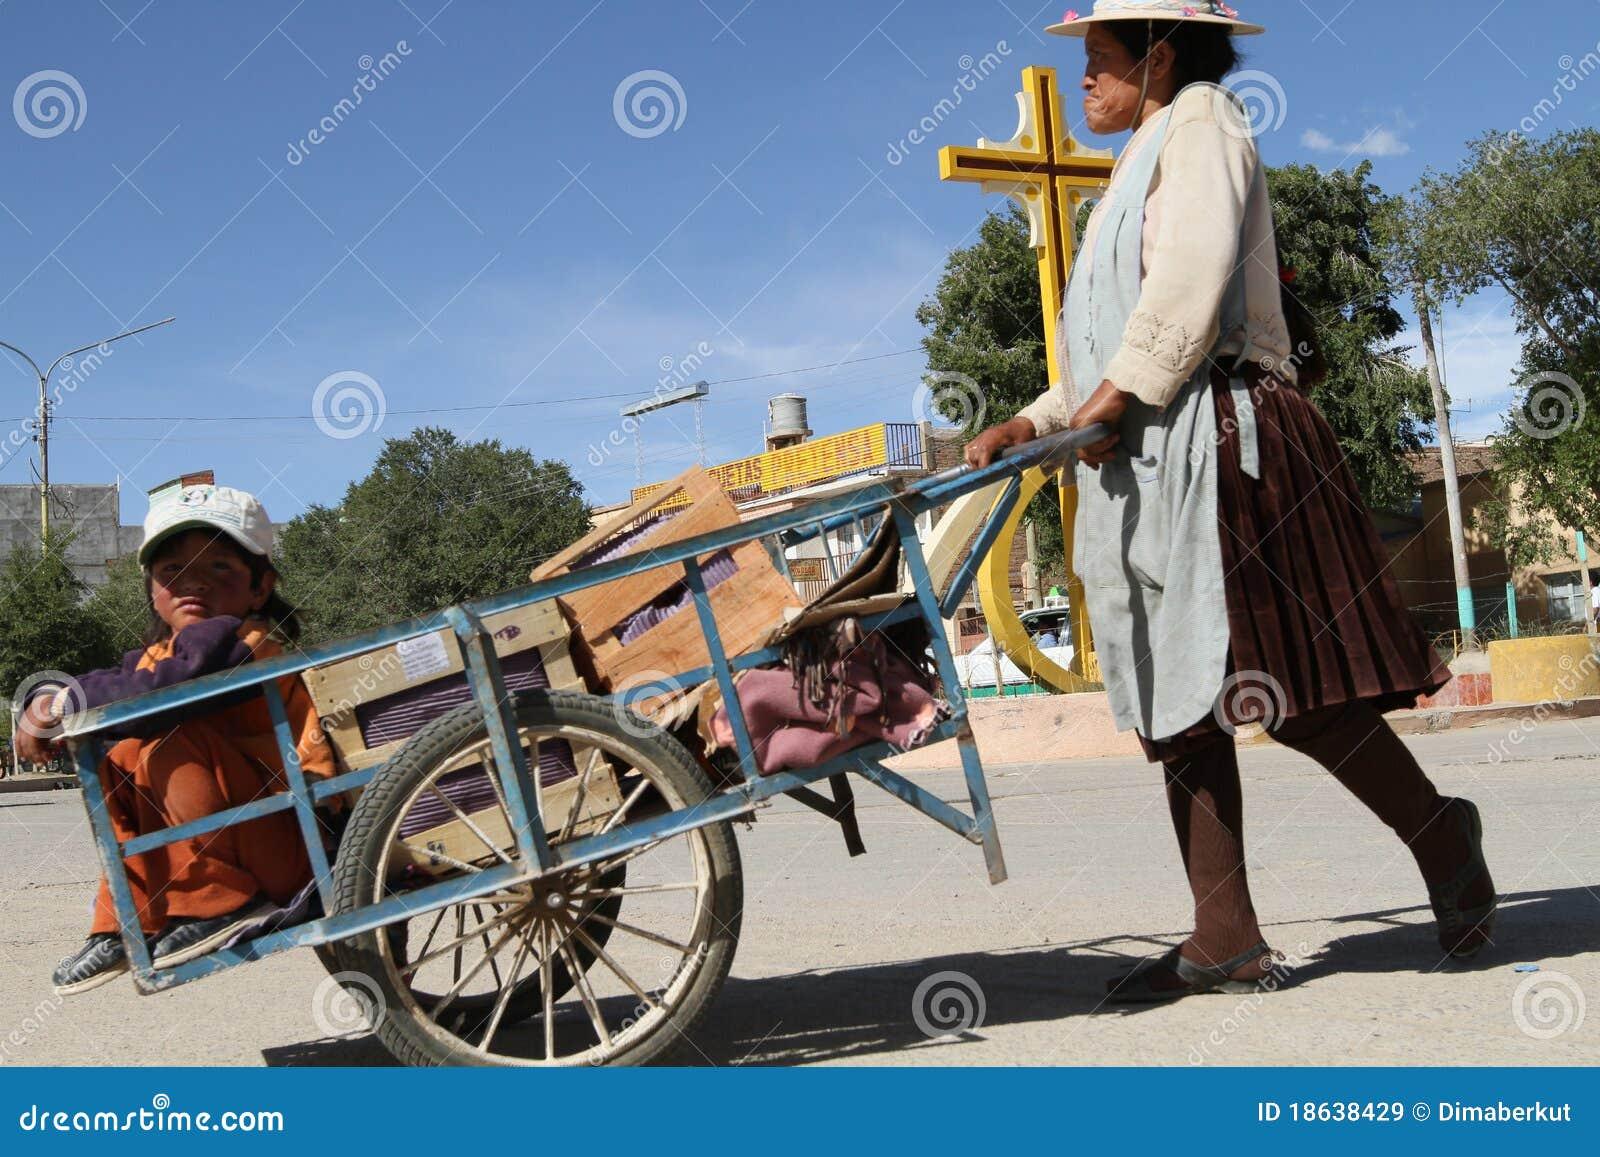 Argentina bolivian granica